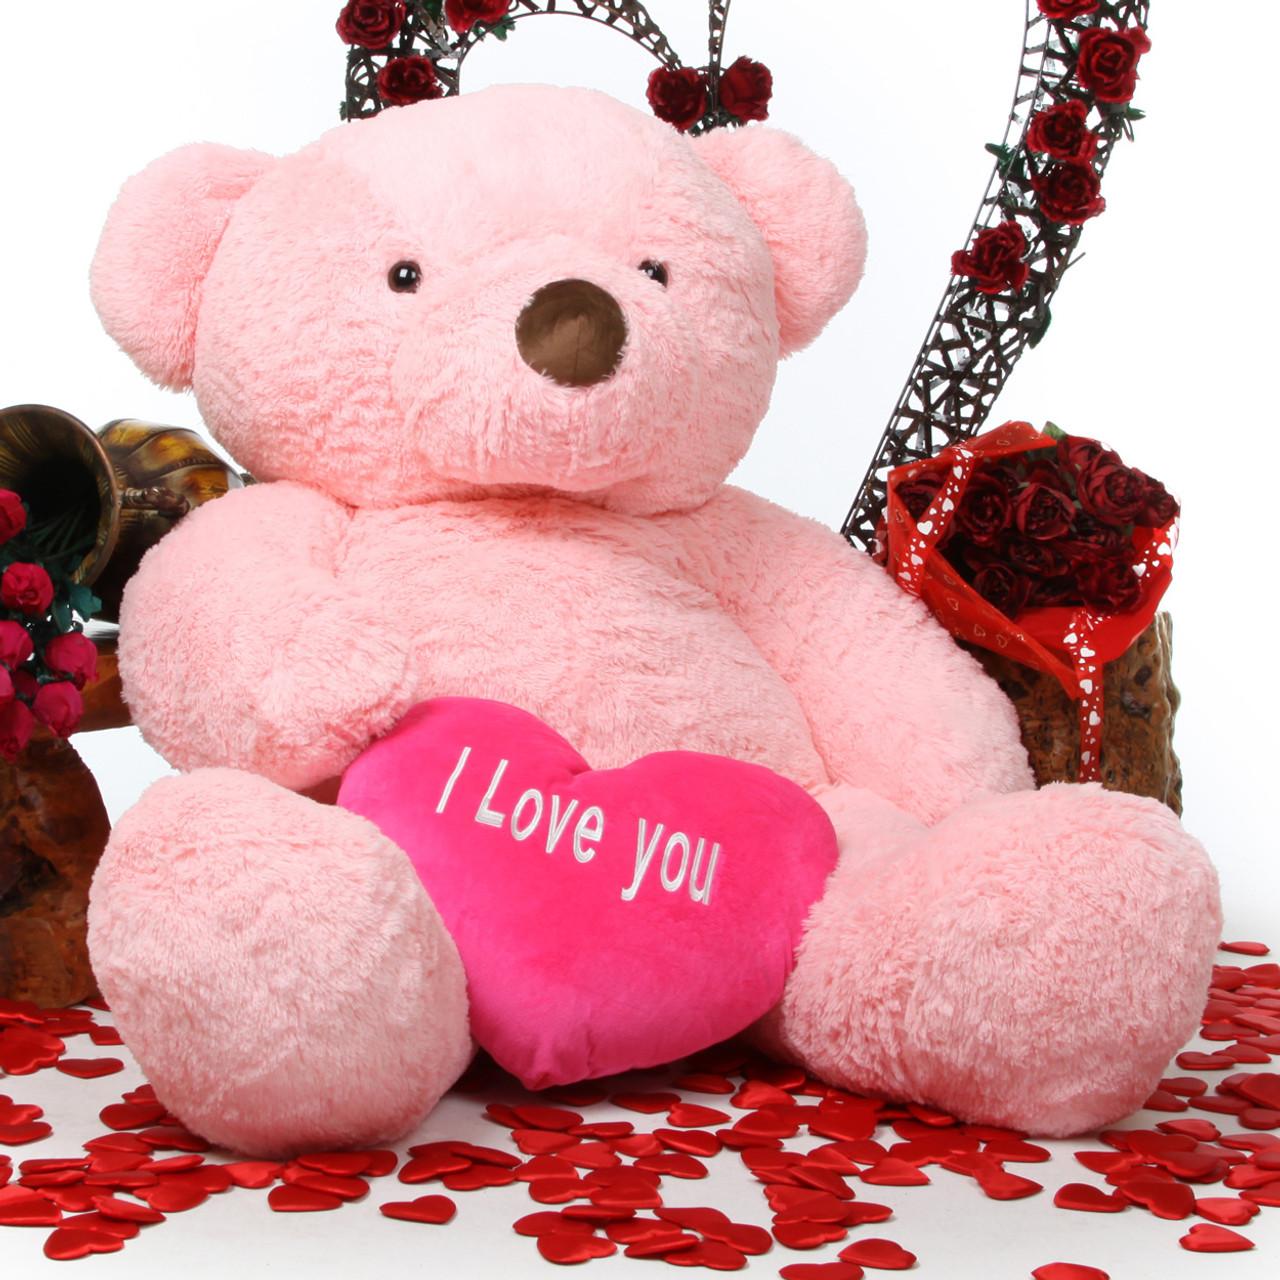 Gigi love chubs 55 pink teddy bear w i love you heart giant gigi love chubs pink teddy bear with heart 55in altavistaventures Choice Image